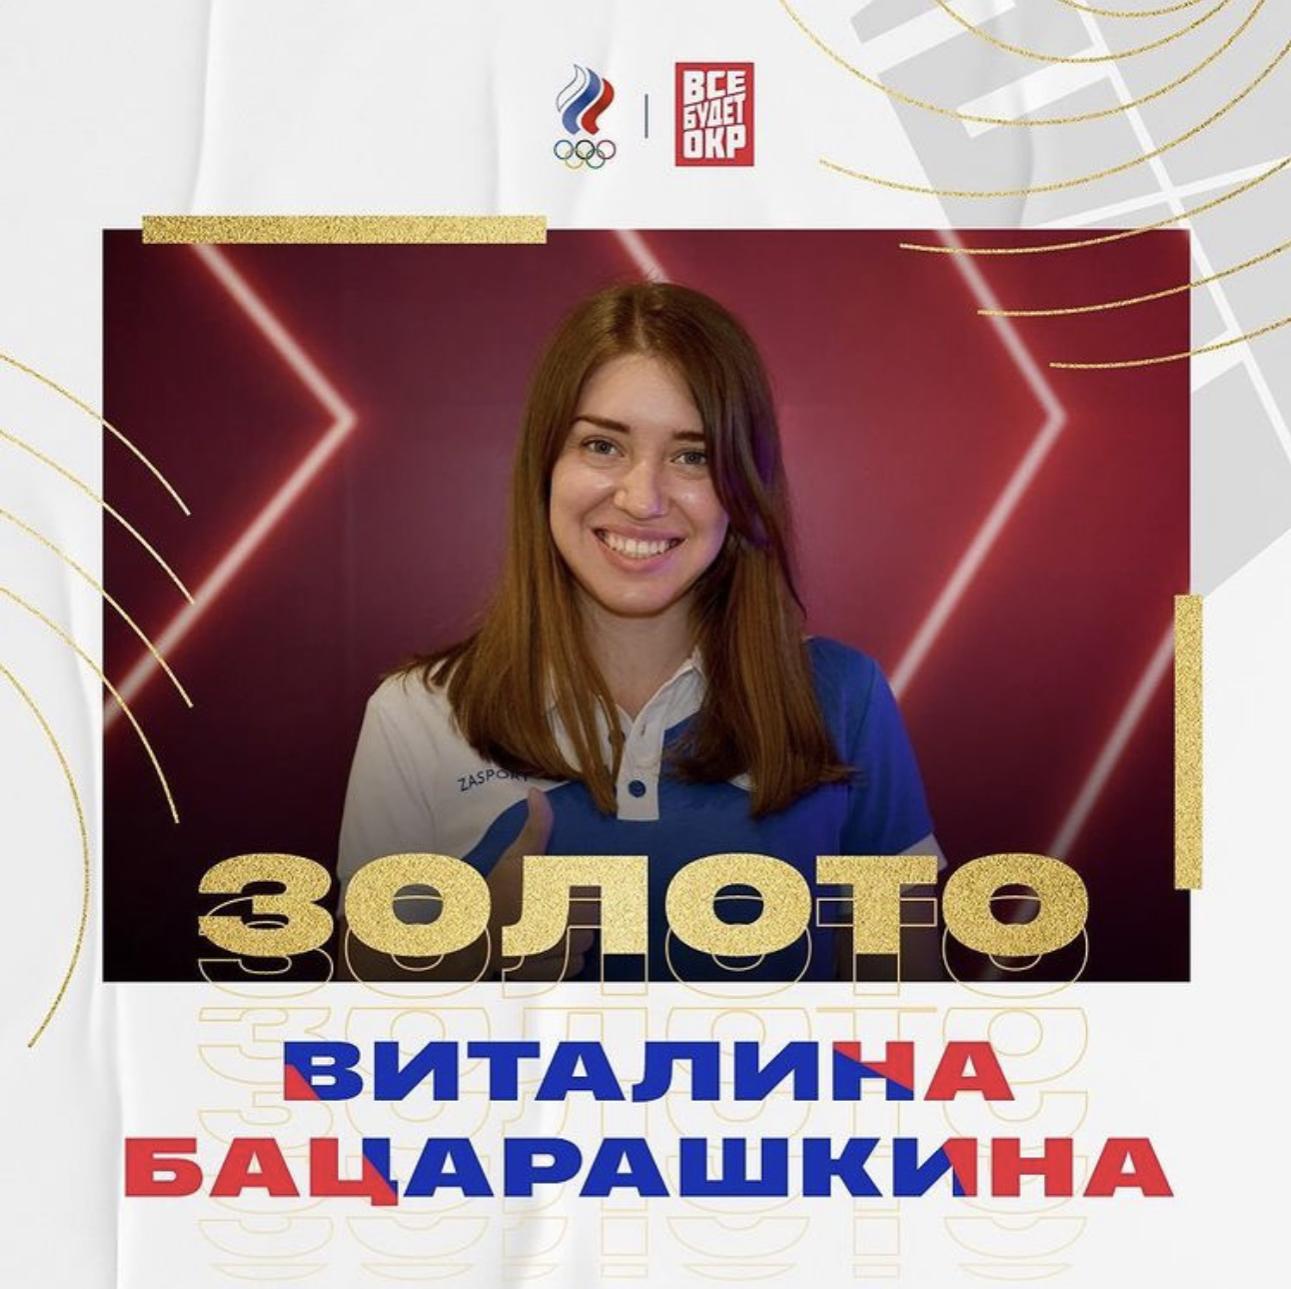 Виталина Бацарашкина